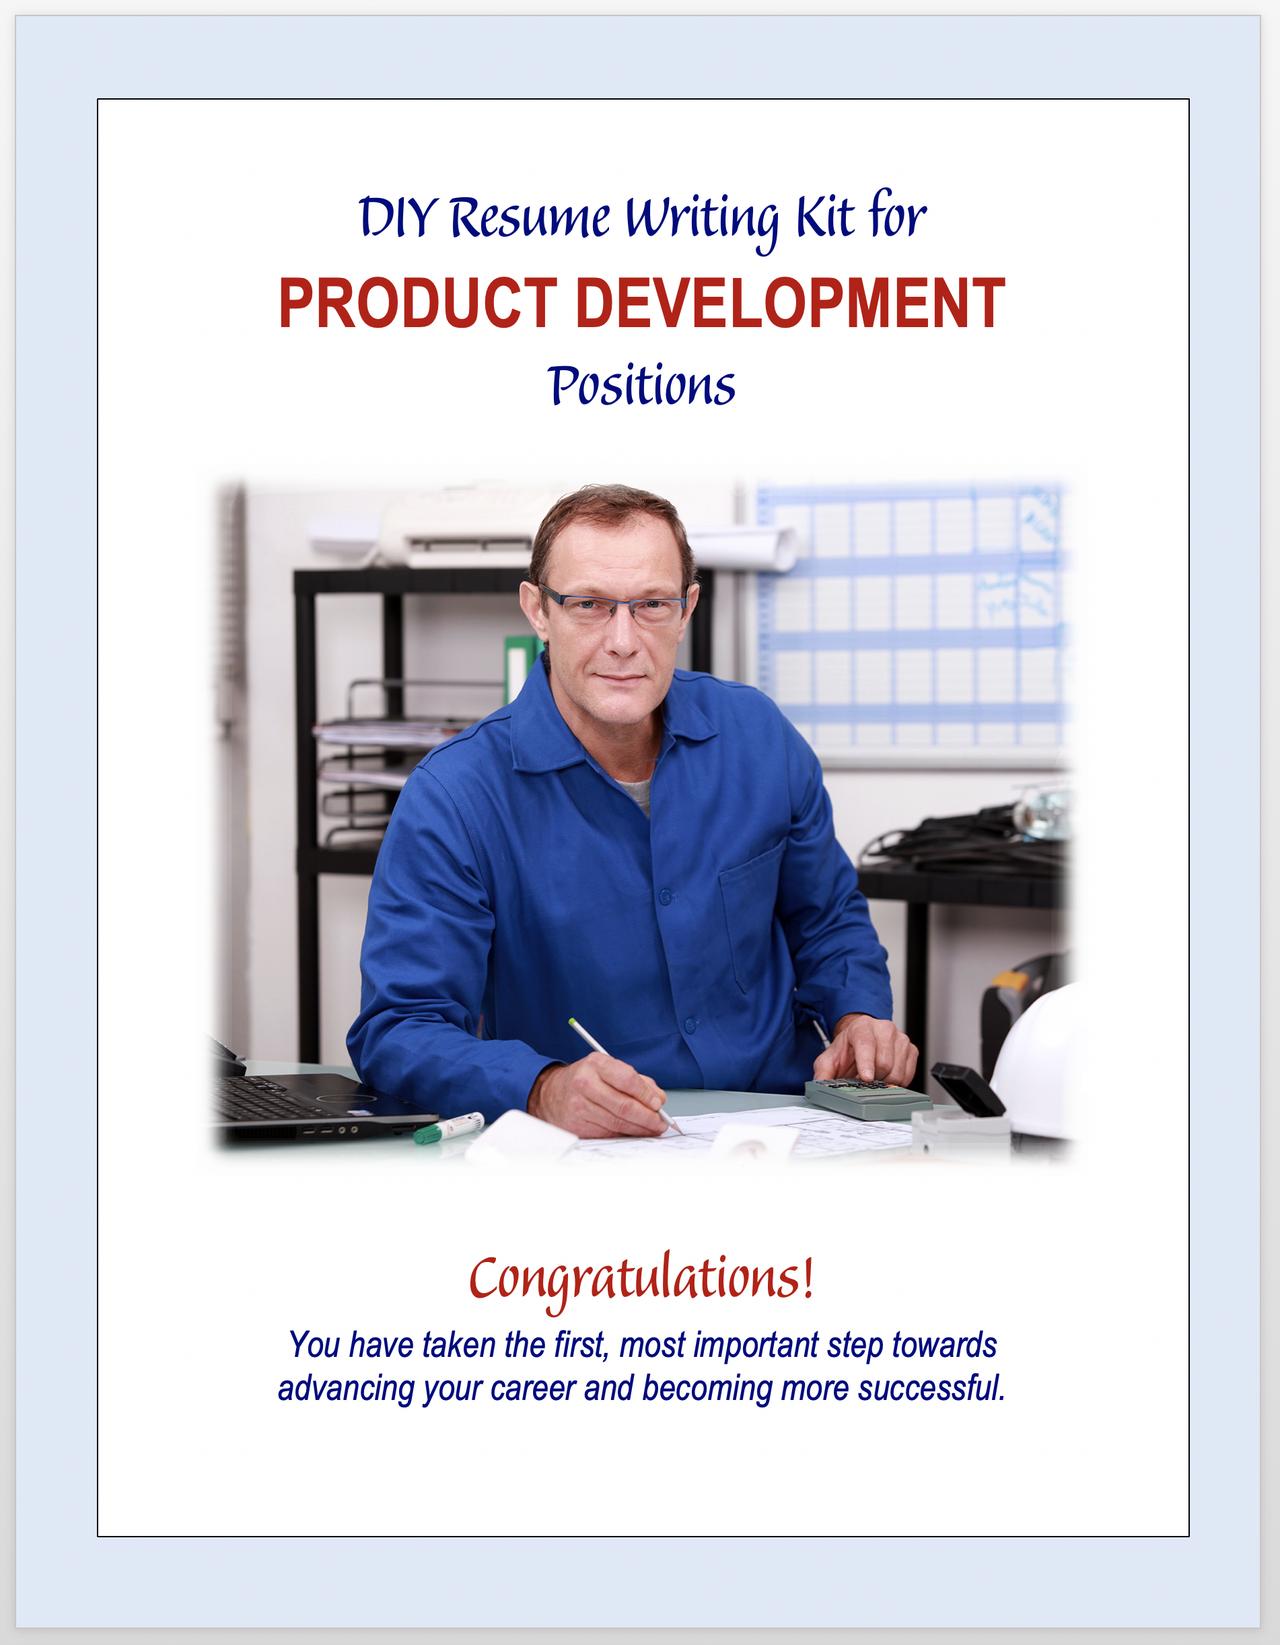 product development.png